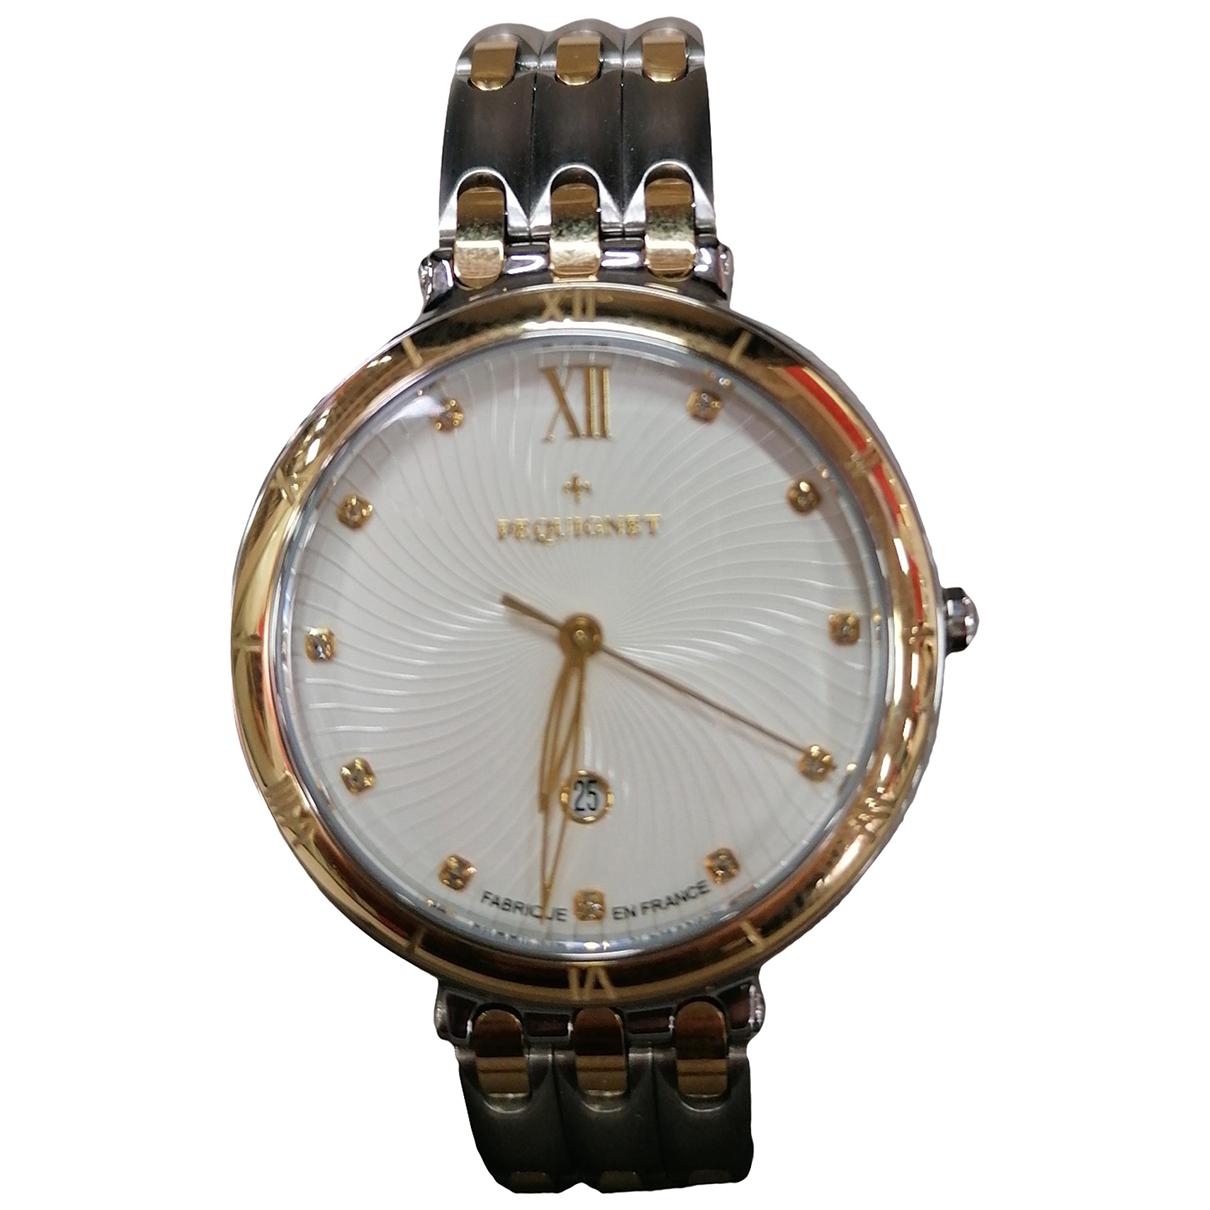 Pequignet \N Uhr in  Silber Vergoldet